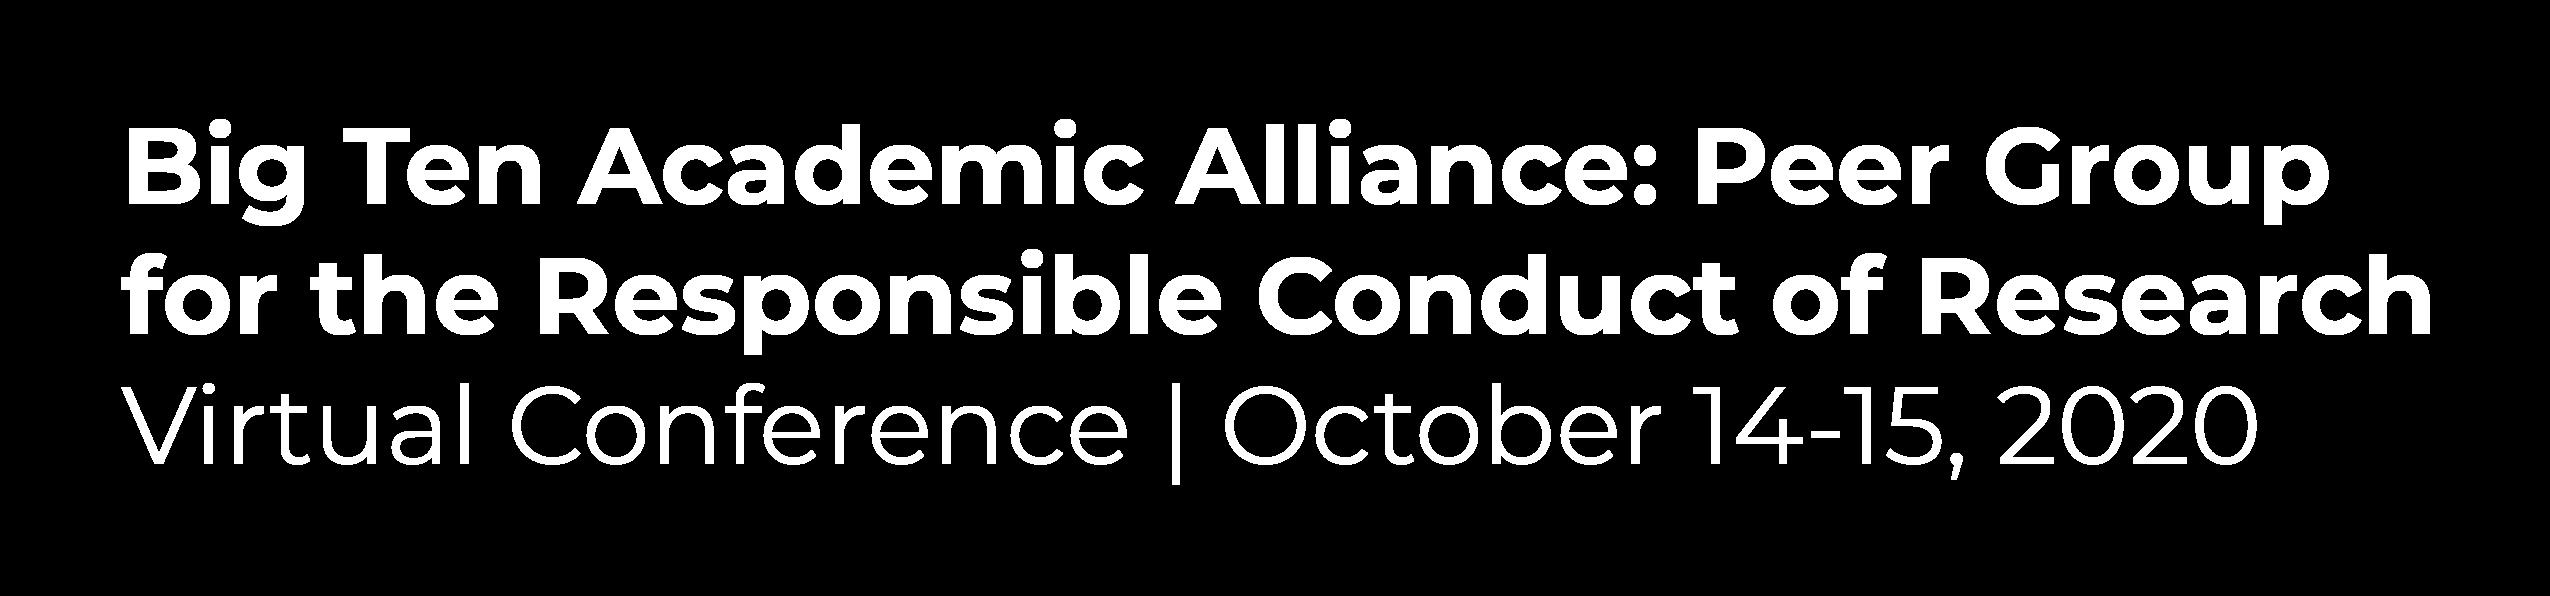 Big Ten Academic Alliance Virtual Conference